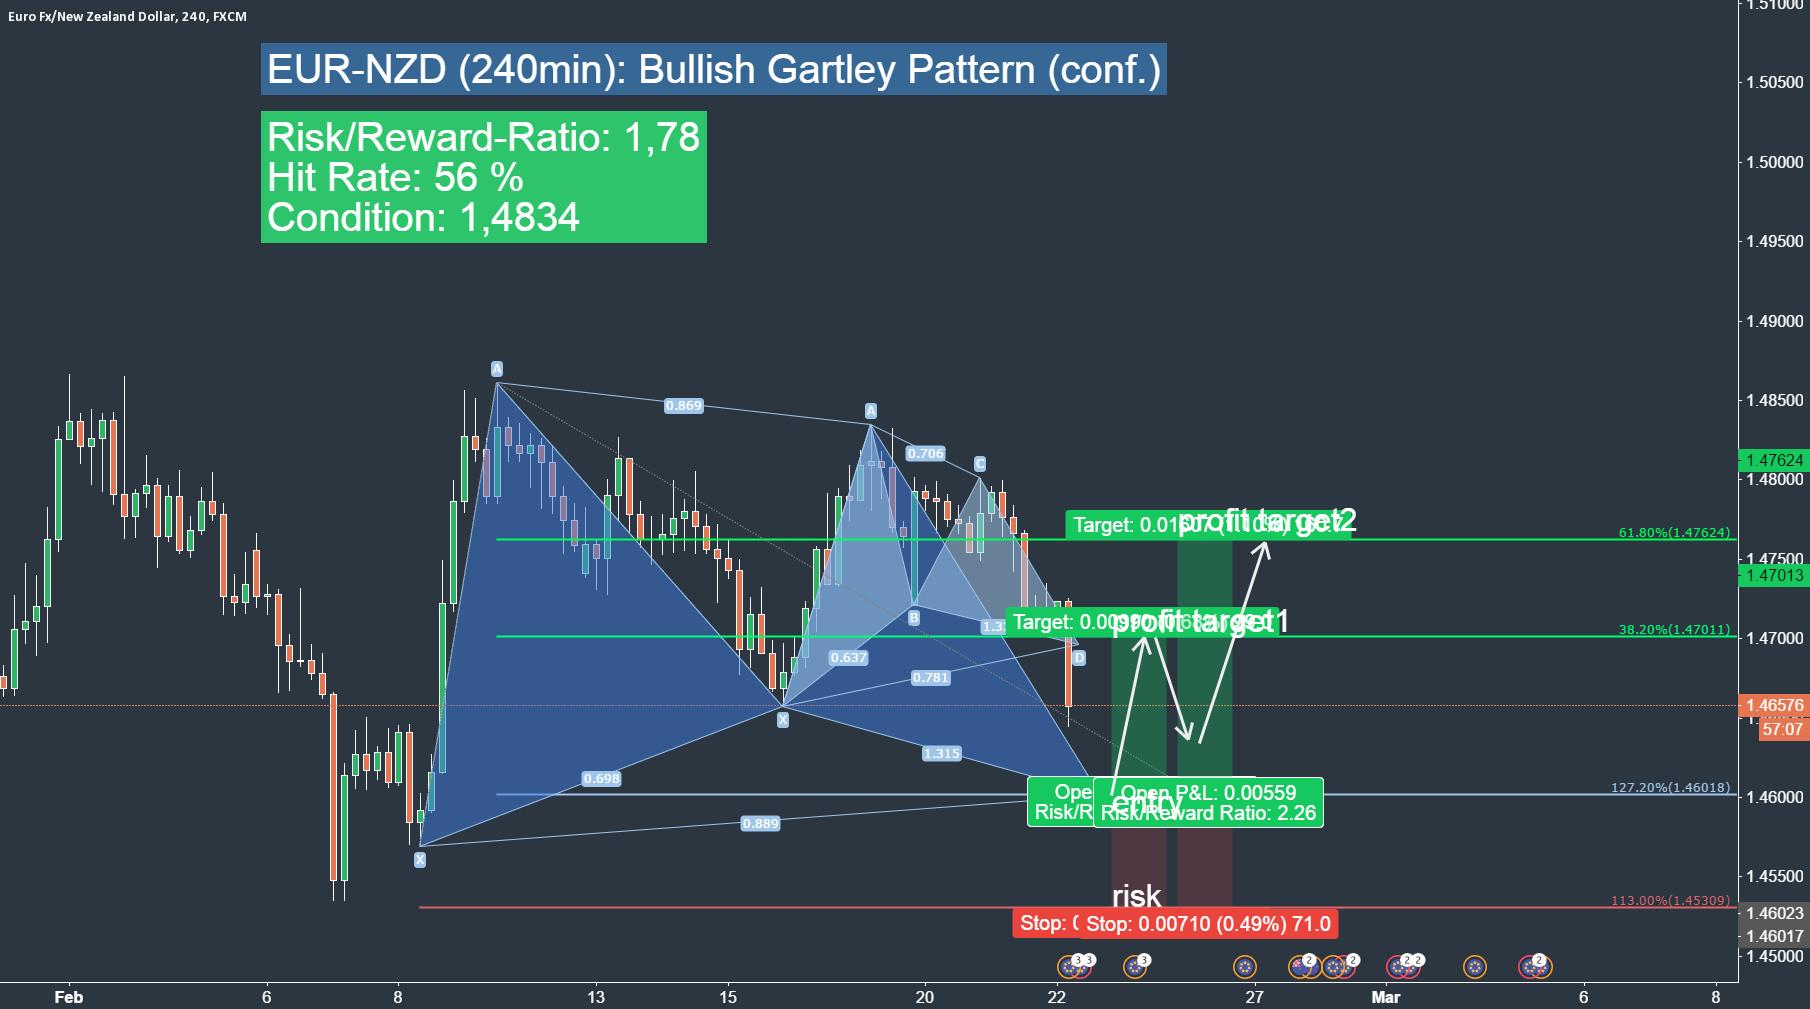 EURNZD - bullish trading chance